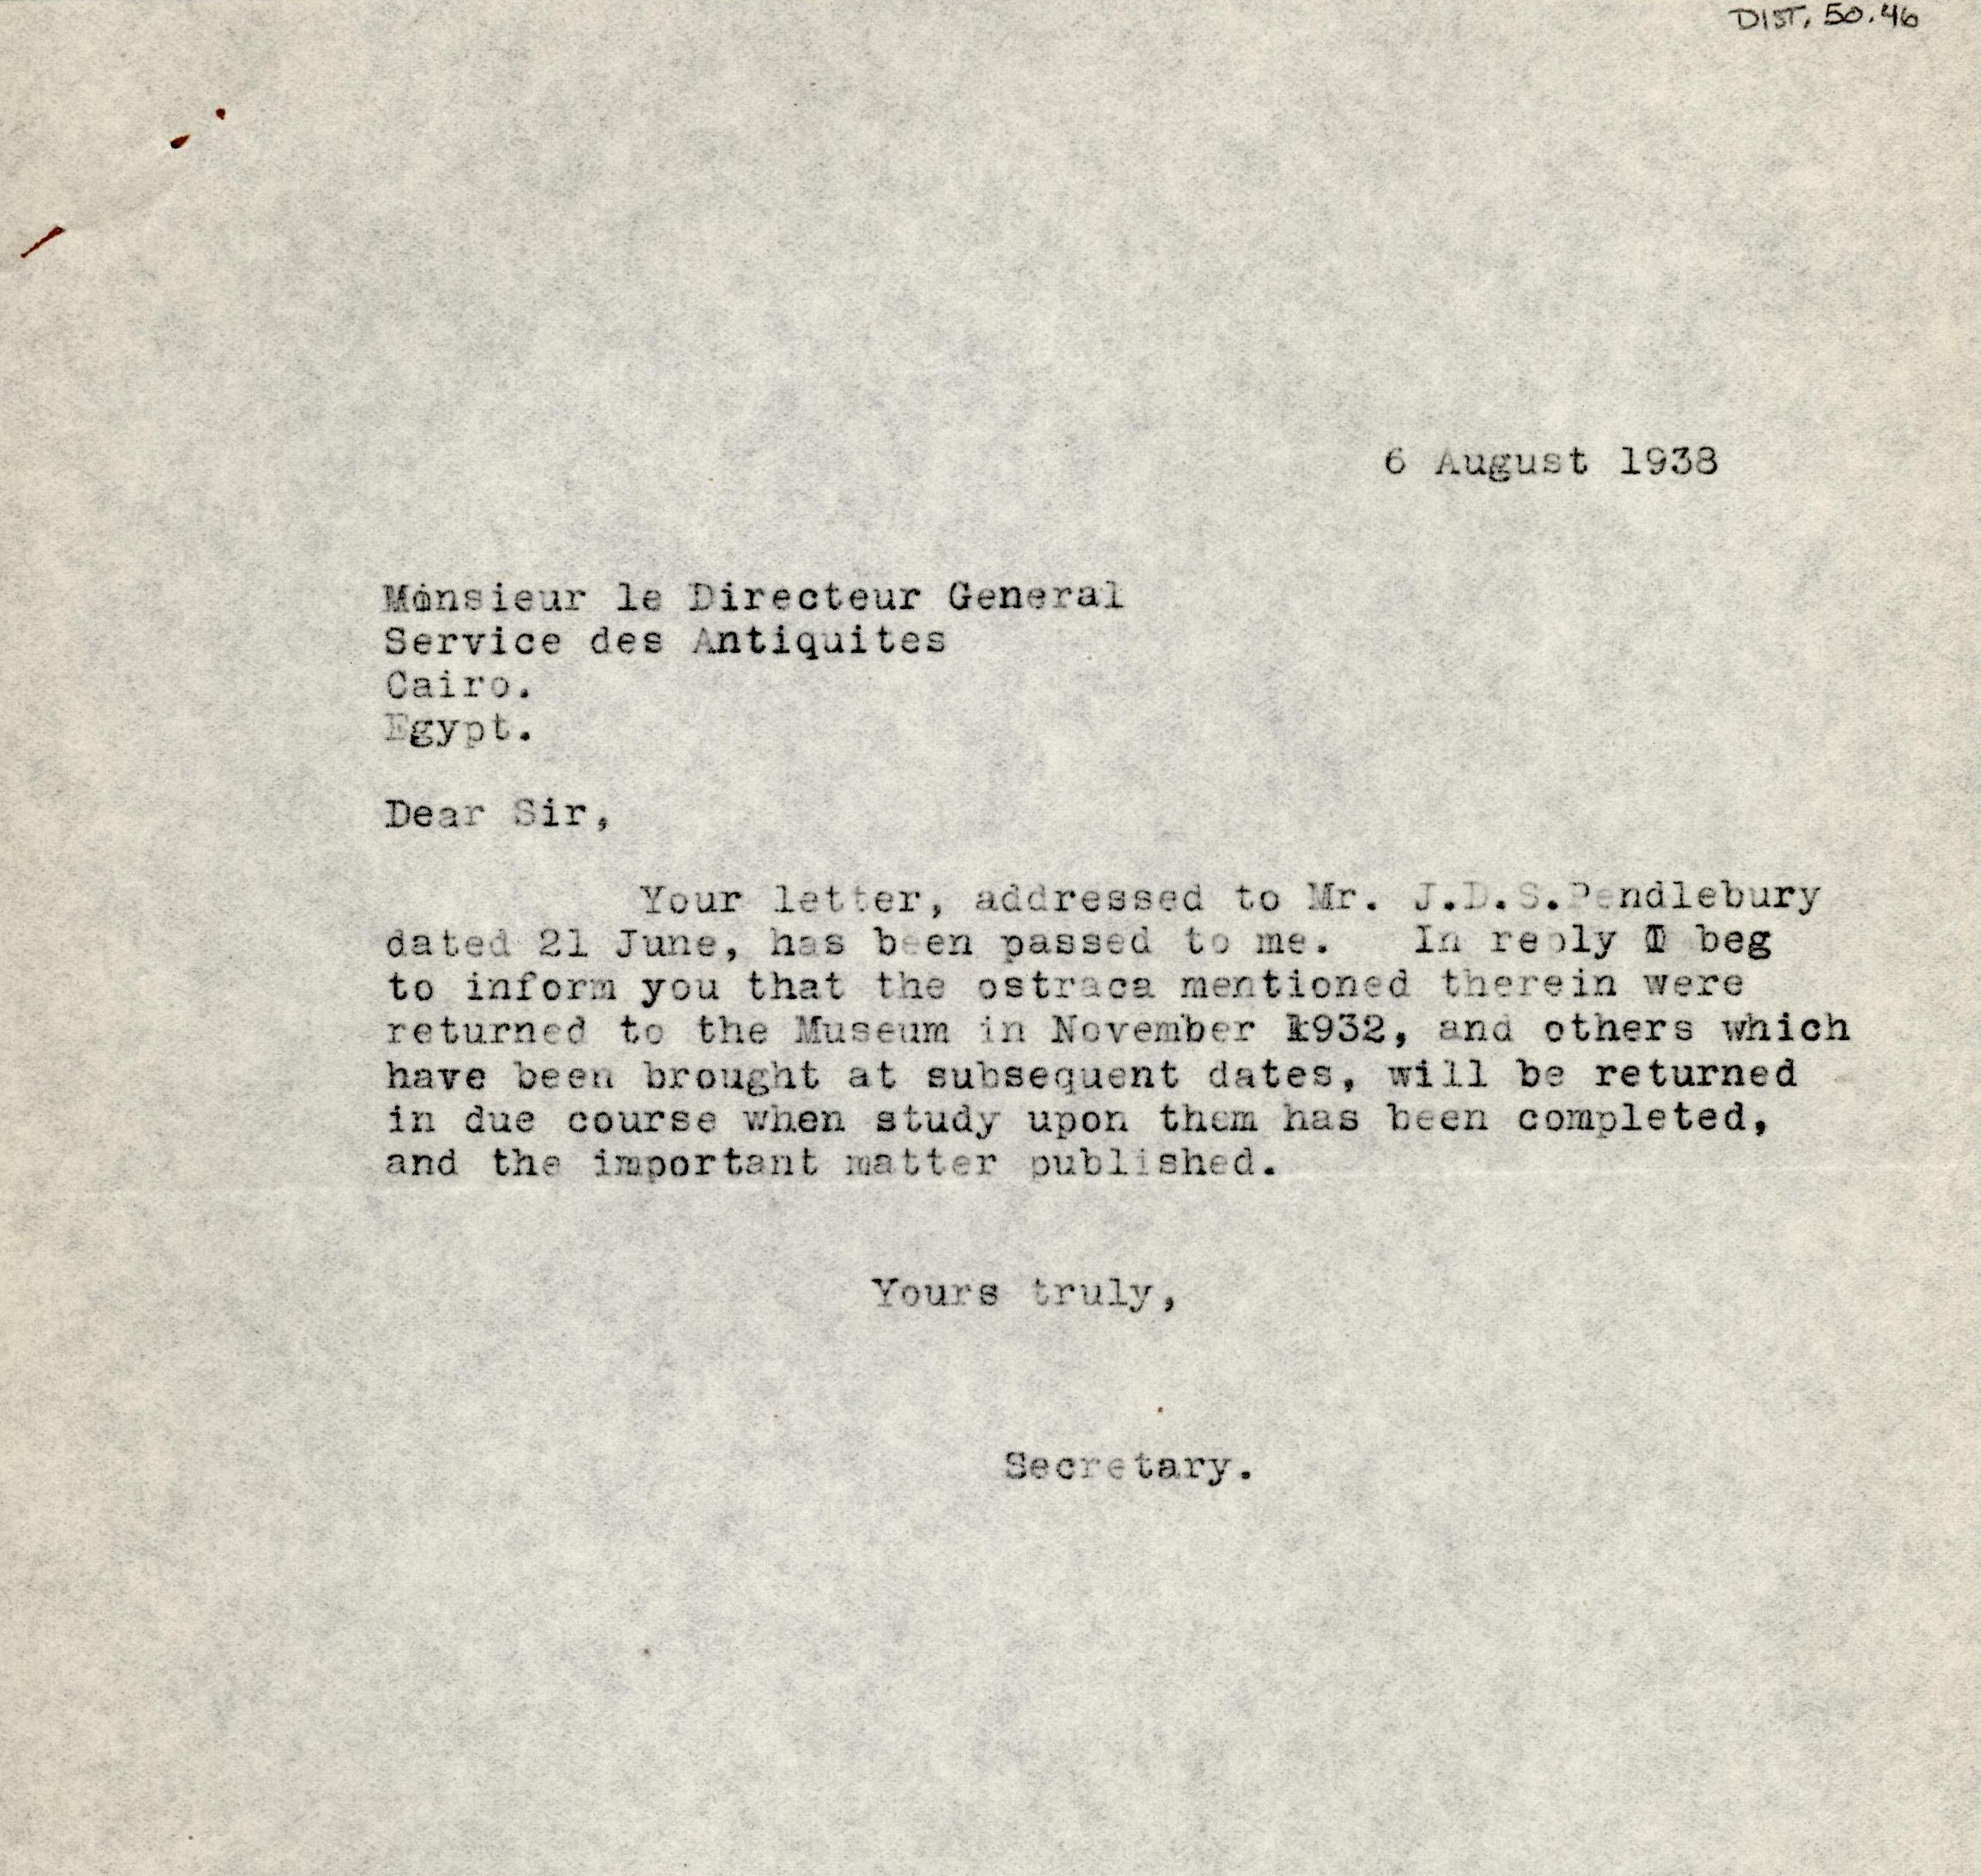 1926-39 correspondence with Antiquities Service DIST.50.46